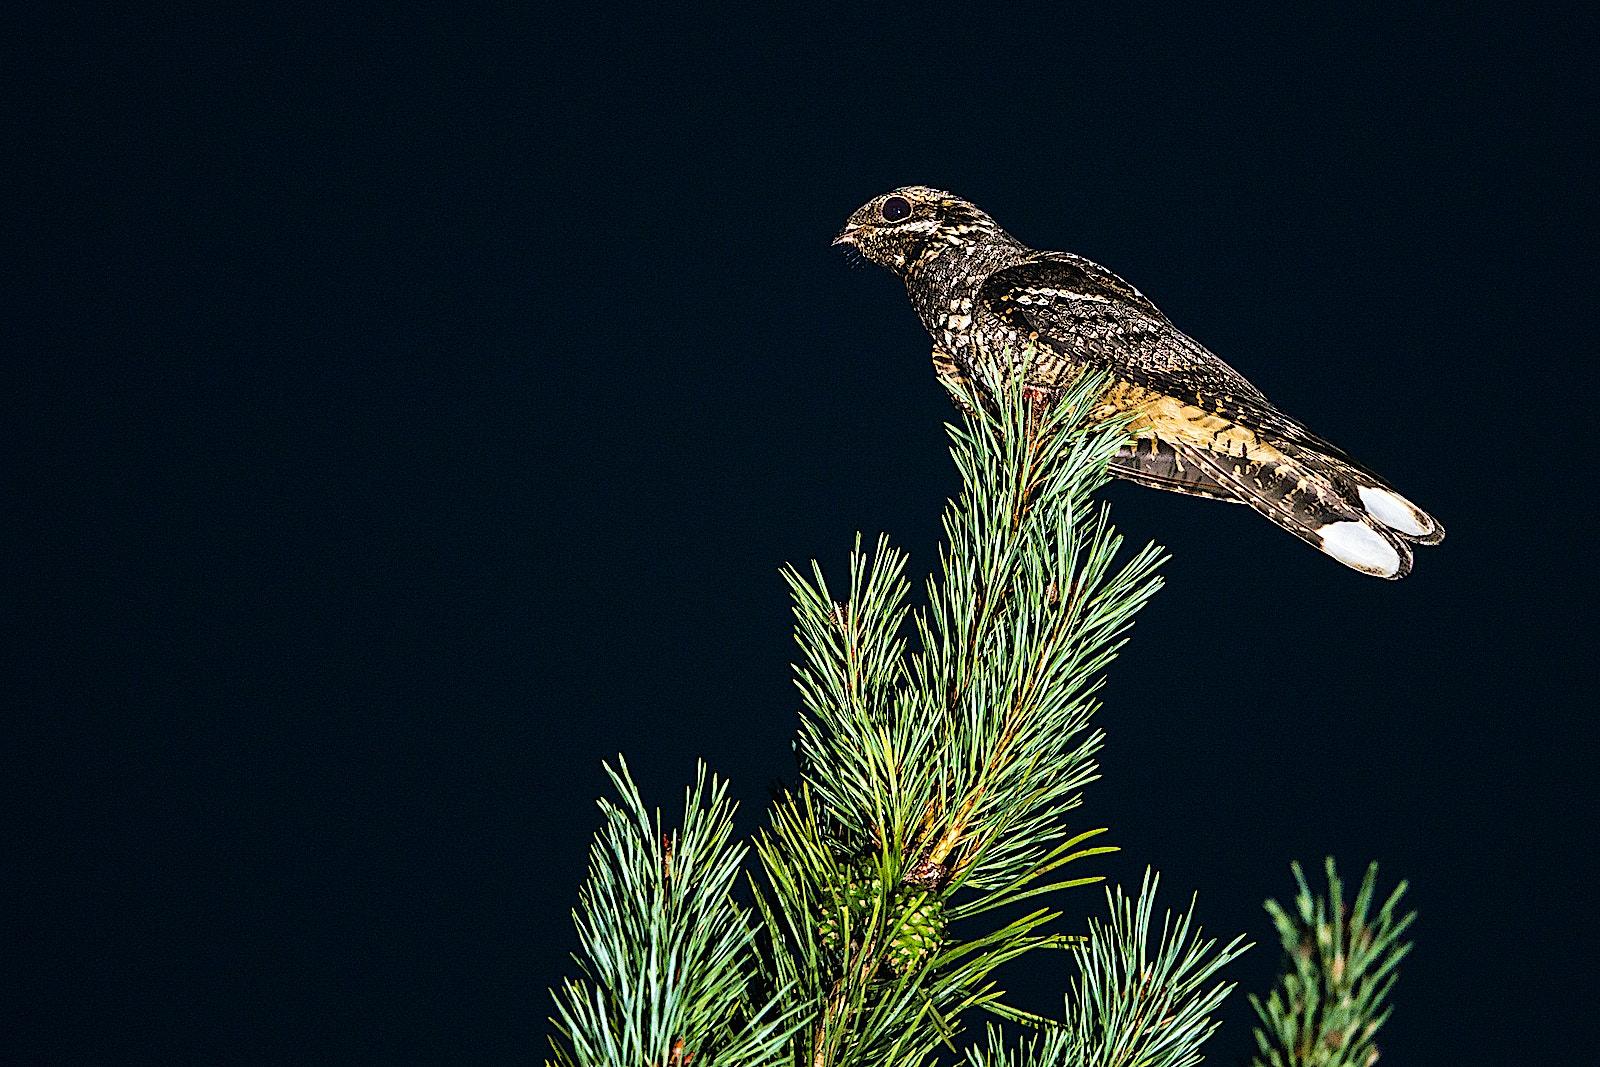 00022723 European nightjar Caprimulgus europaeus male on Scots pine Pinus sylvestris at night Ashdown Forest Sussex England James Warwick Wildscreen